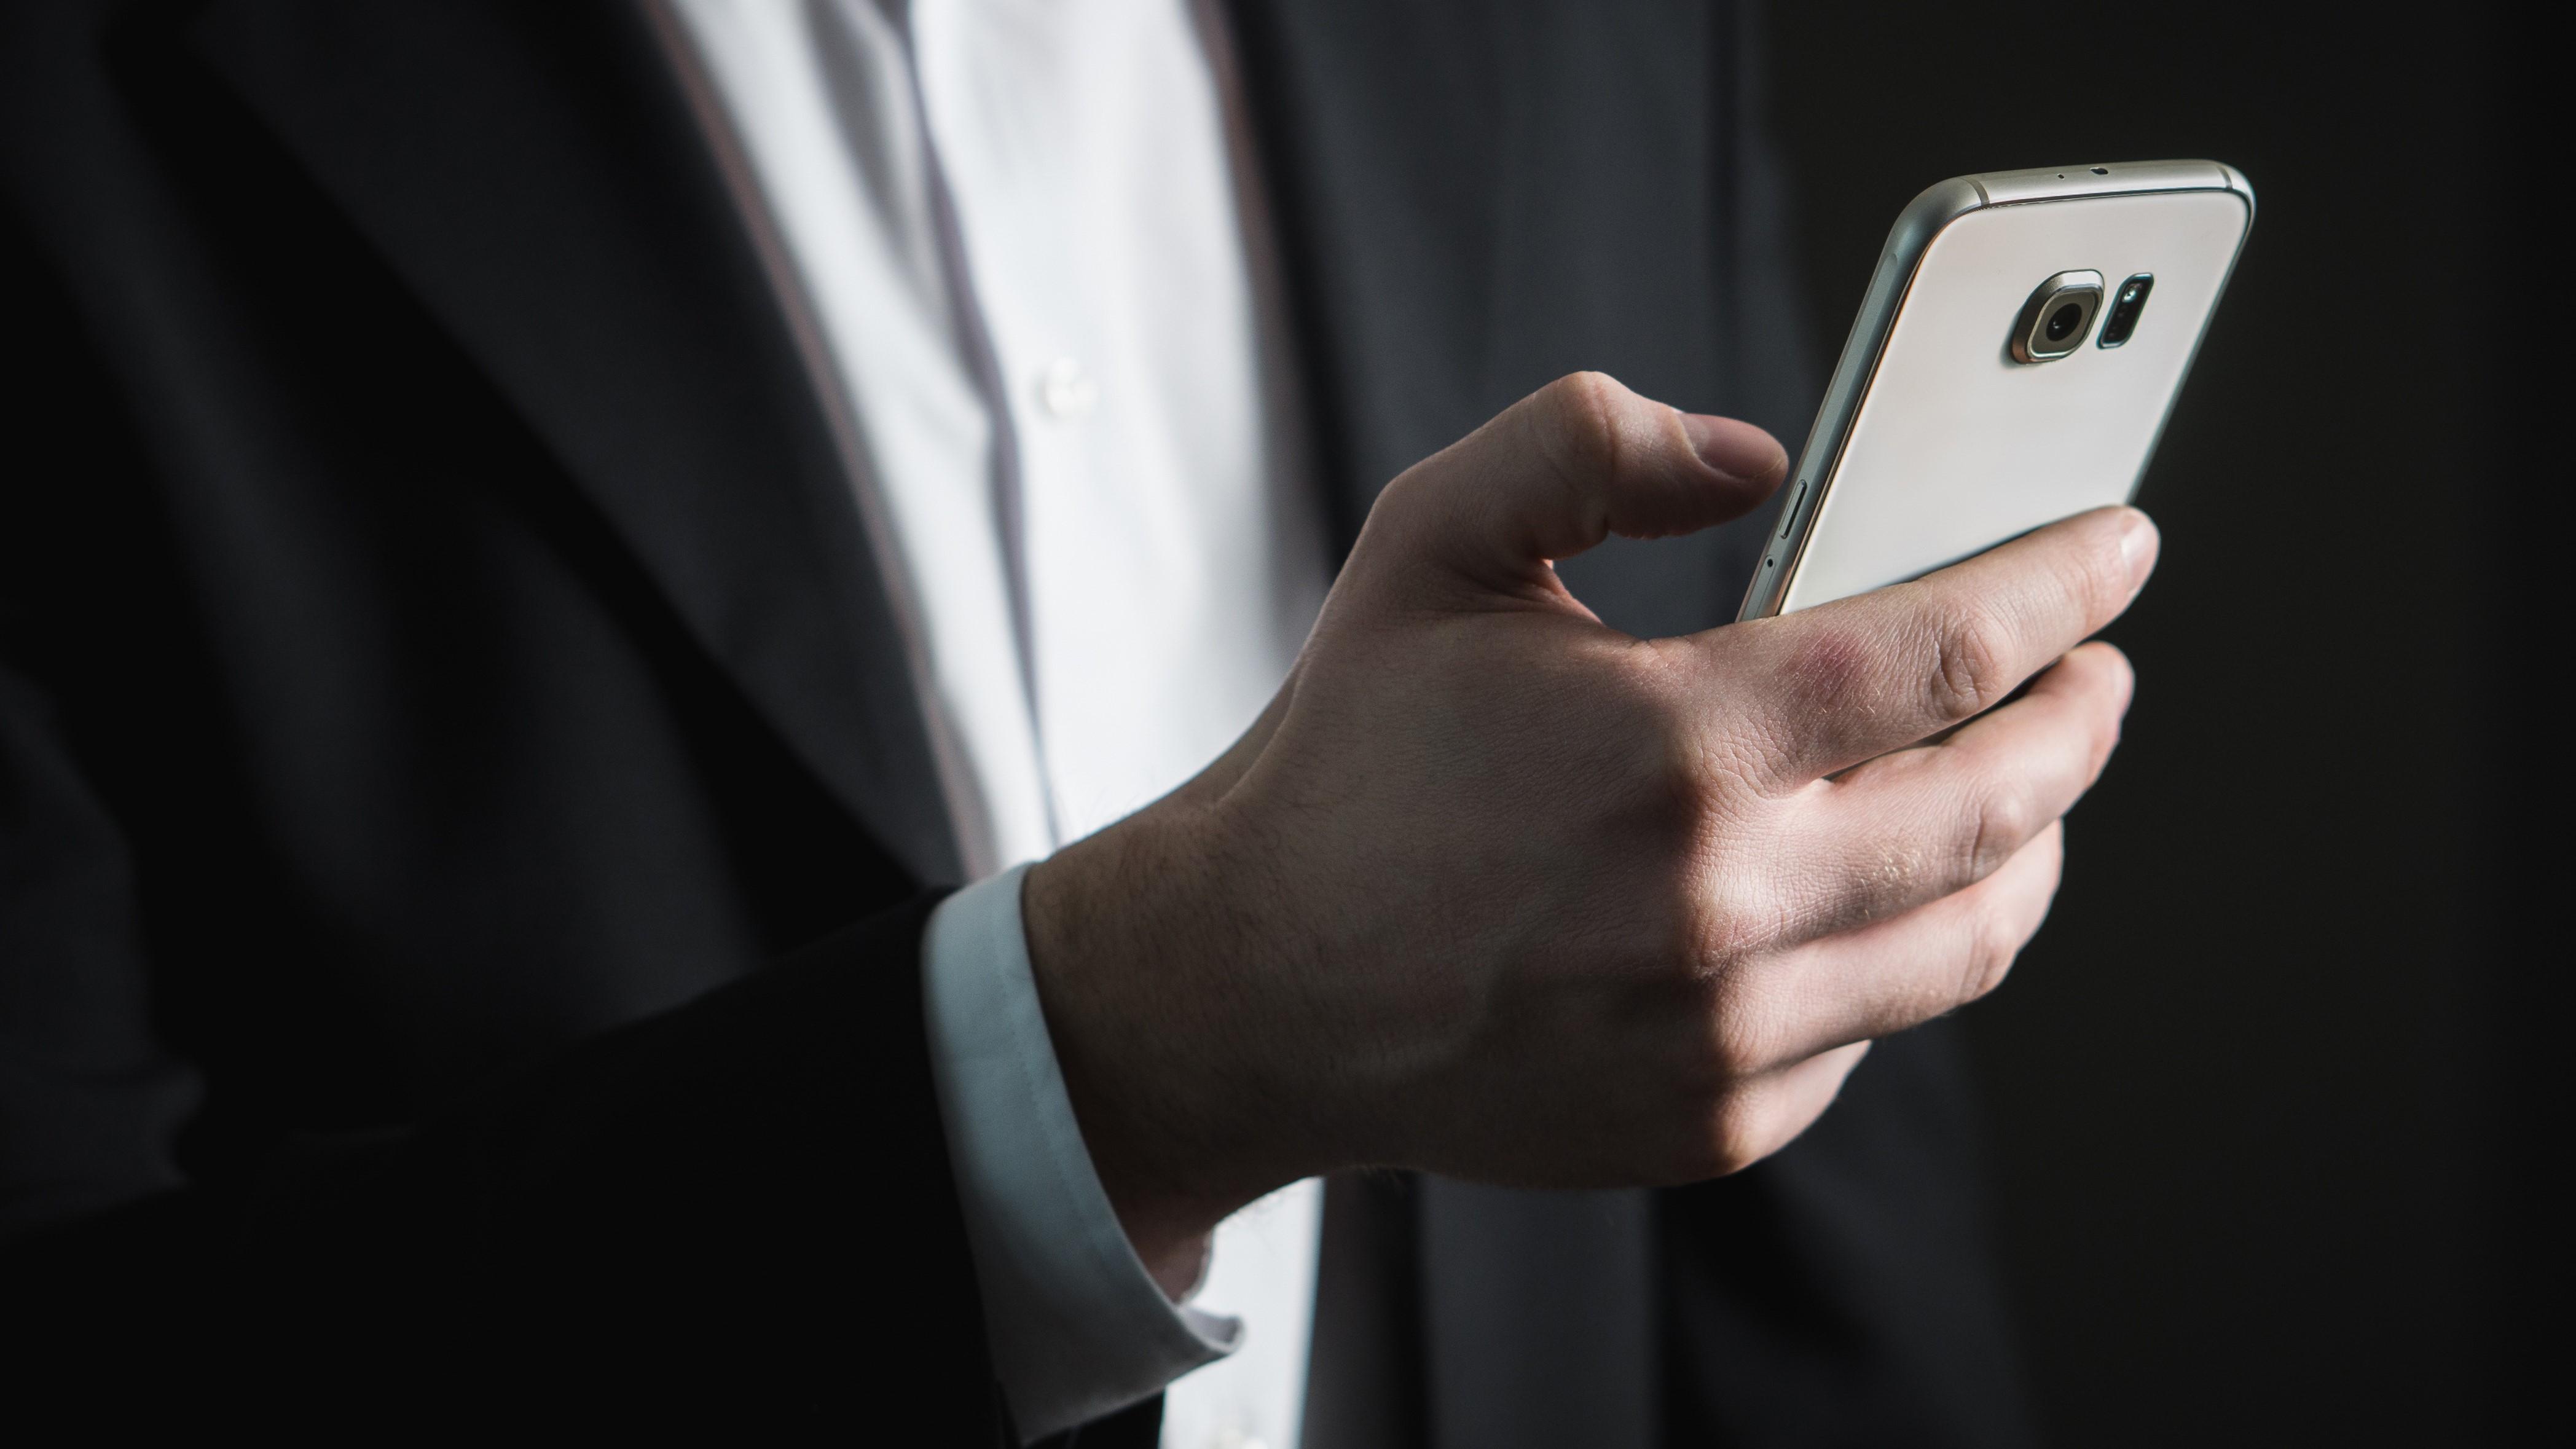 Best business phone system of 2019 | TechRadar